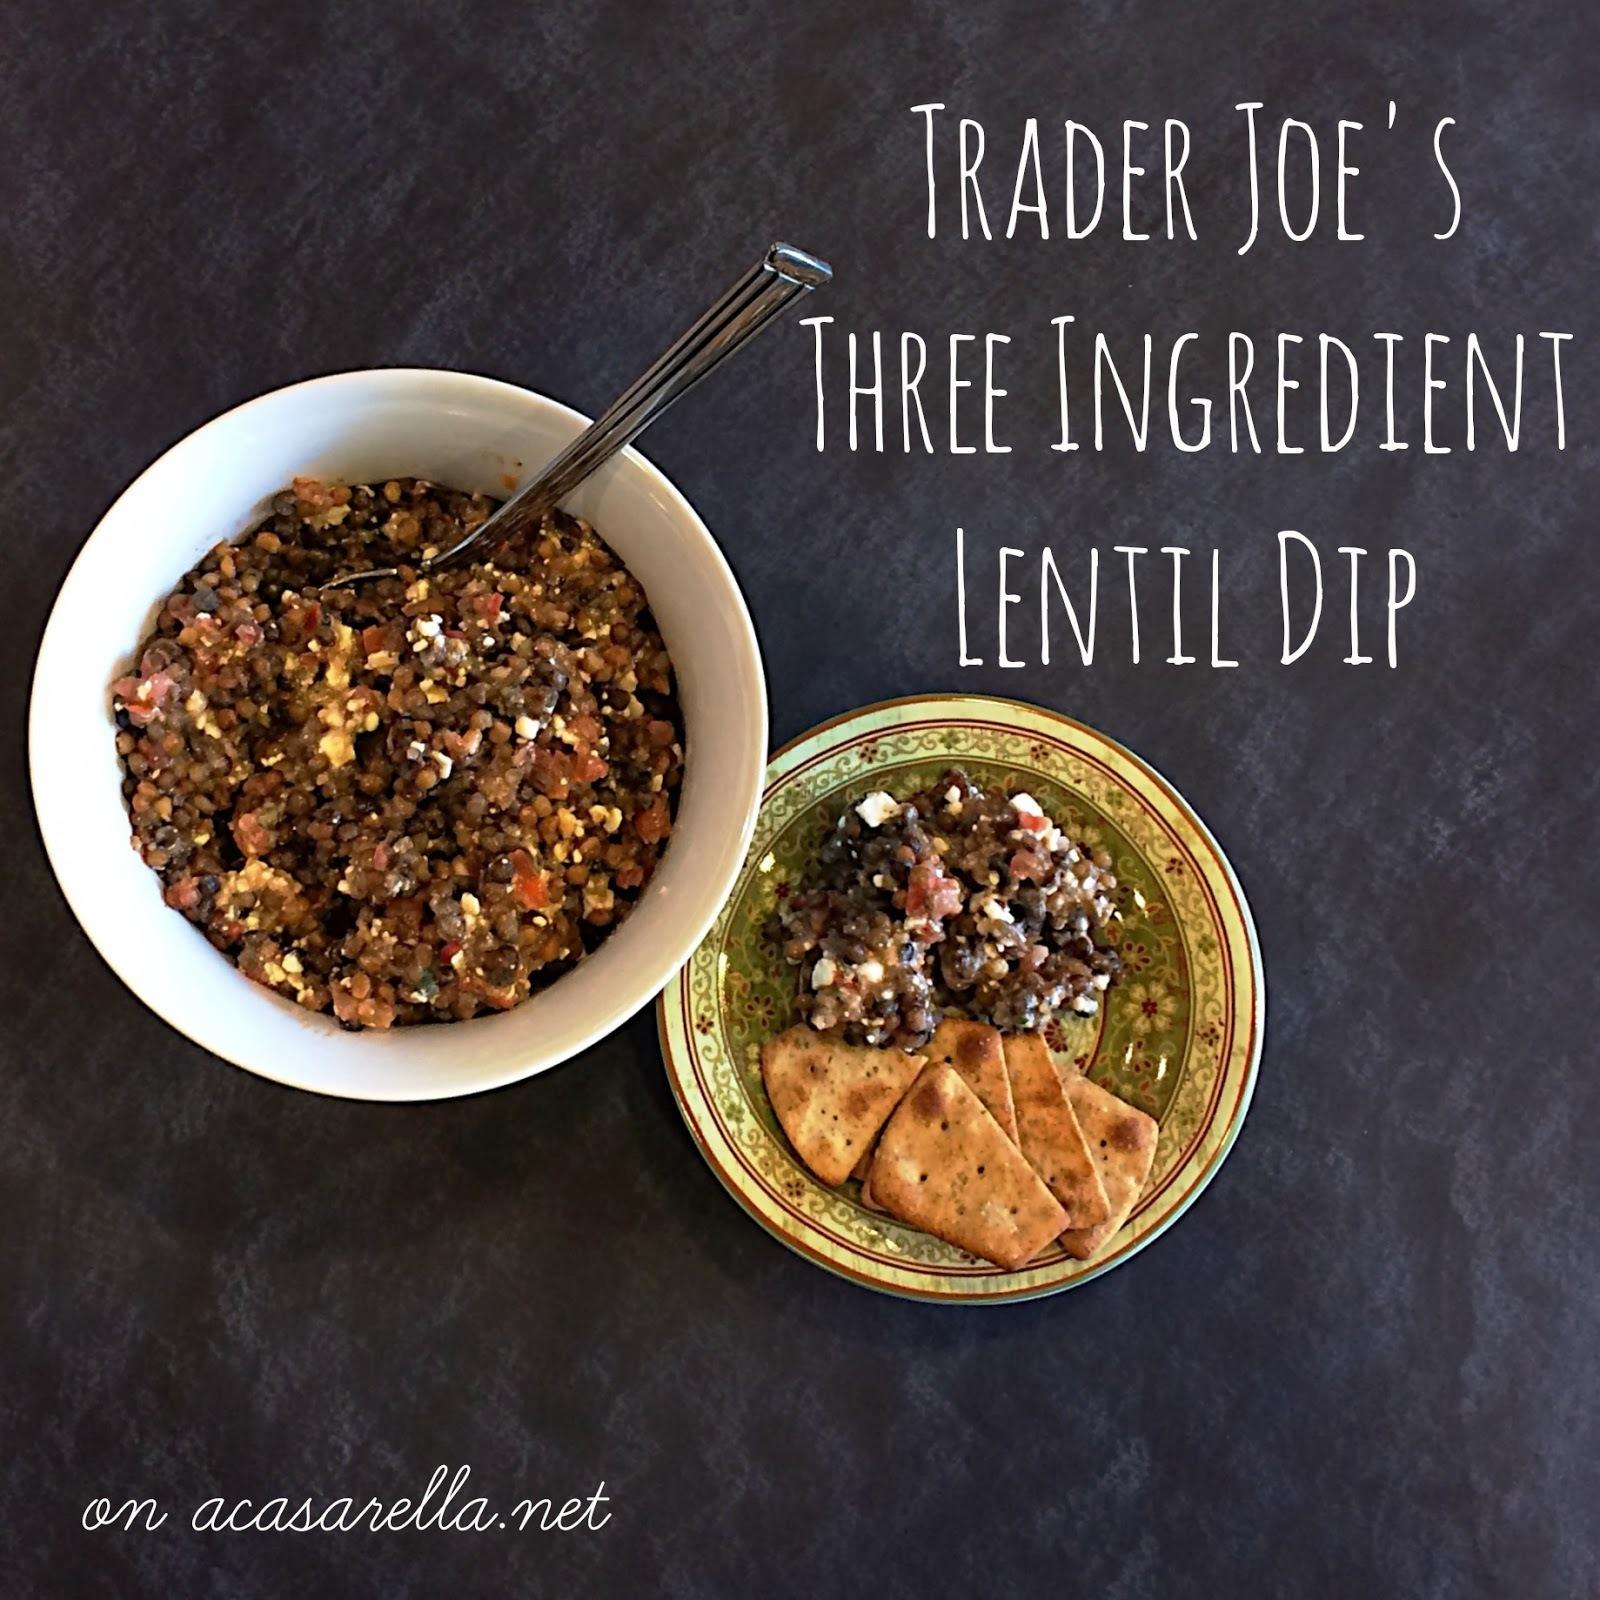 23 Trader Joe's Recipes Your Family Needs To Try